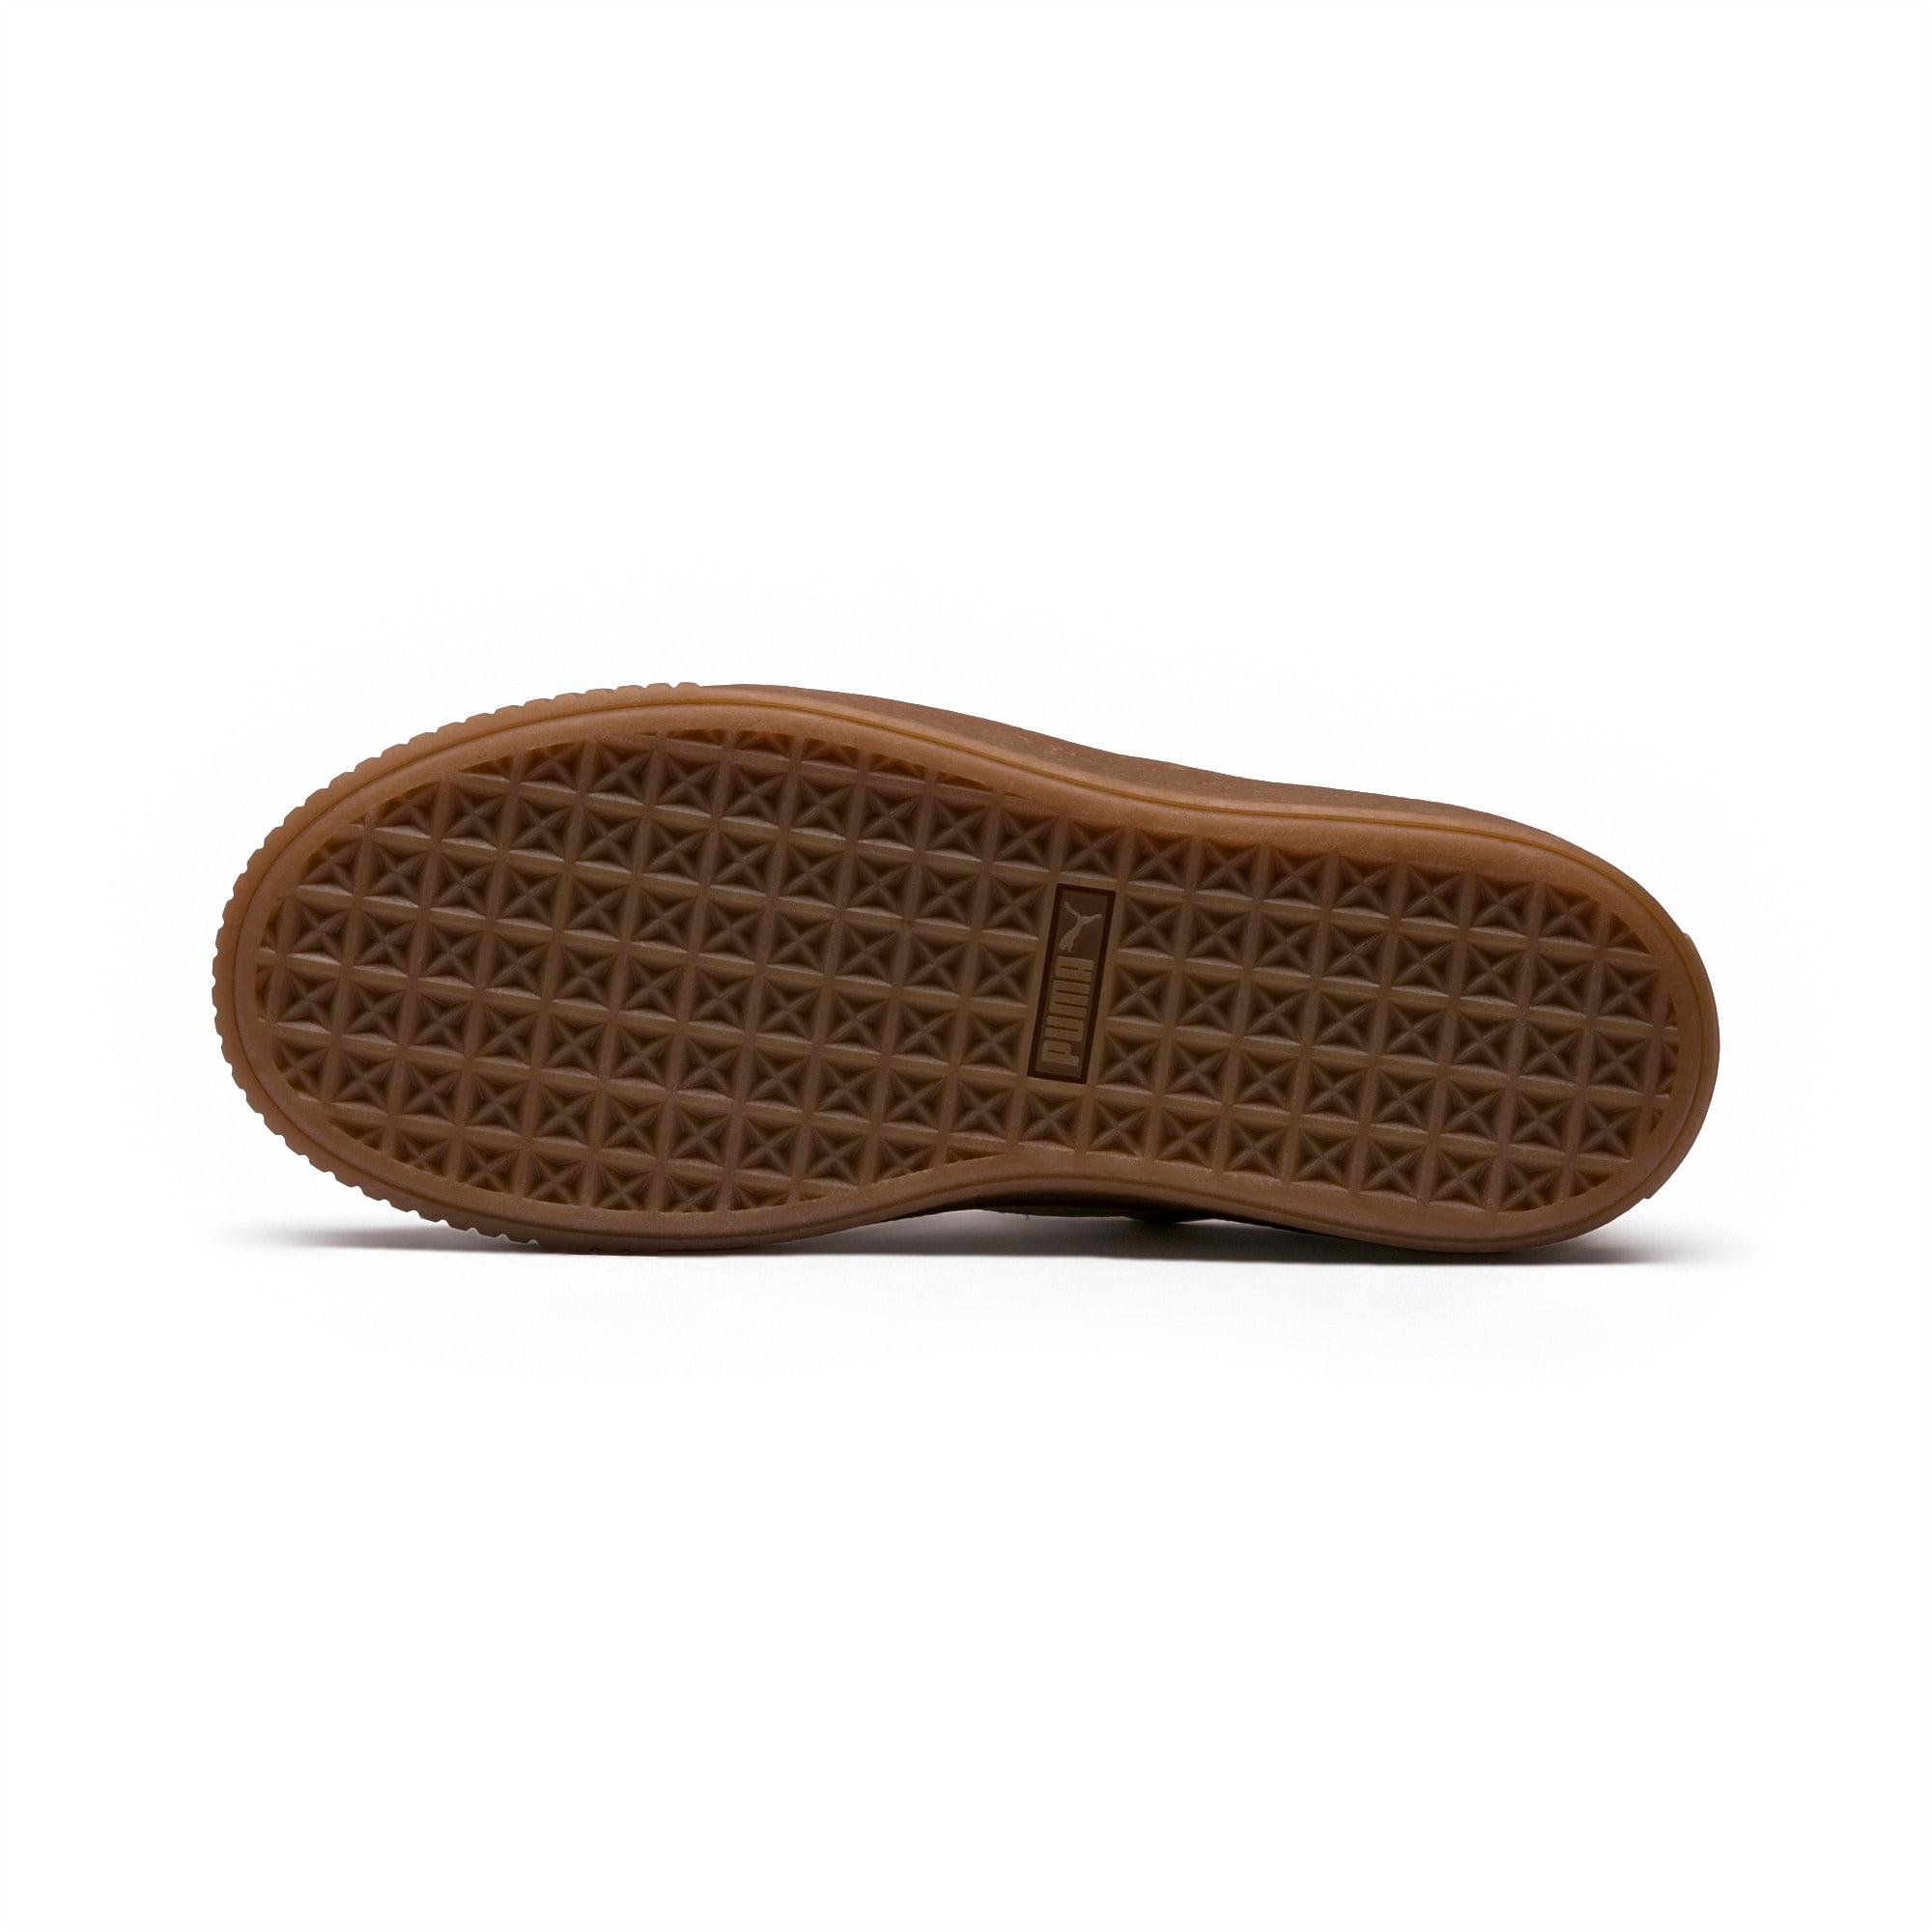 Zapatos deportivos PUMA x NATUREL Veg Tan con plataforma, para mujer